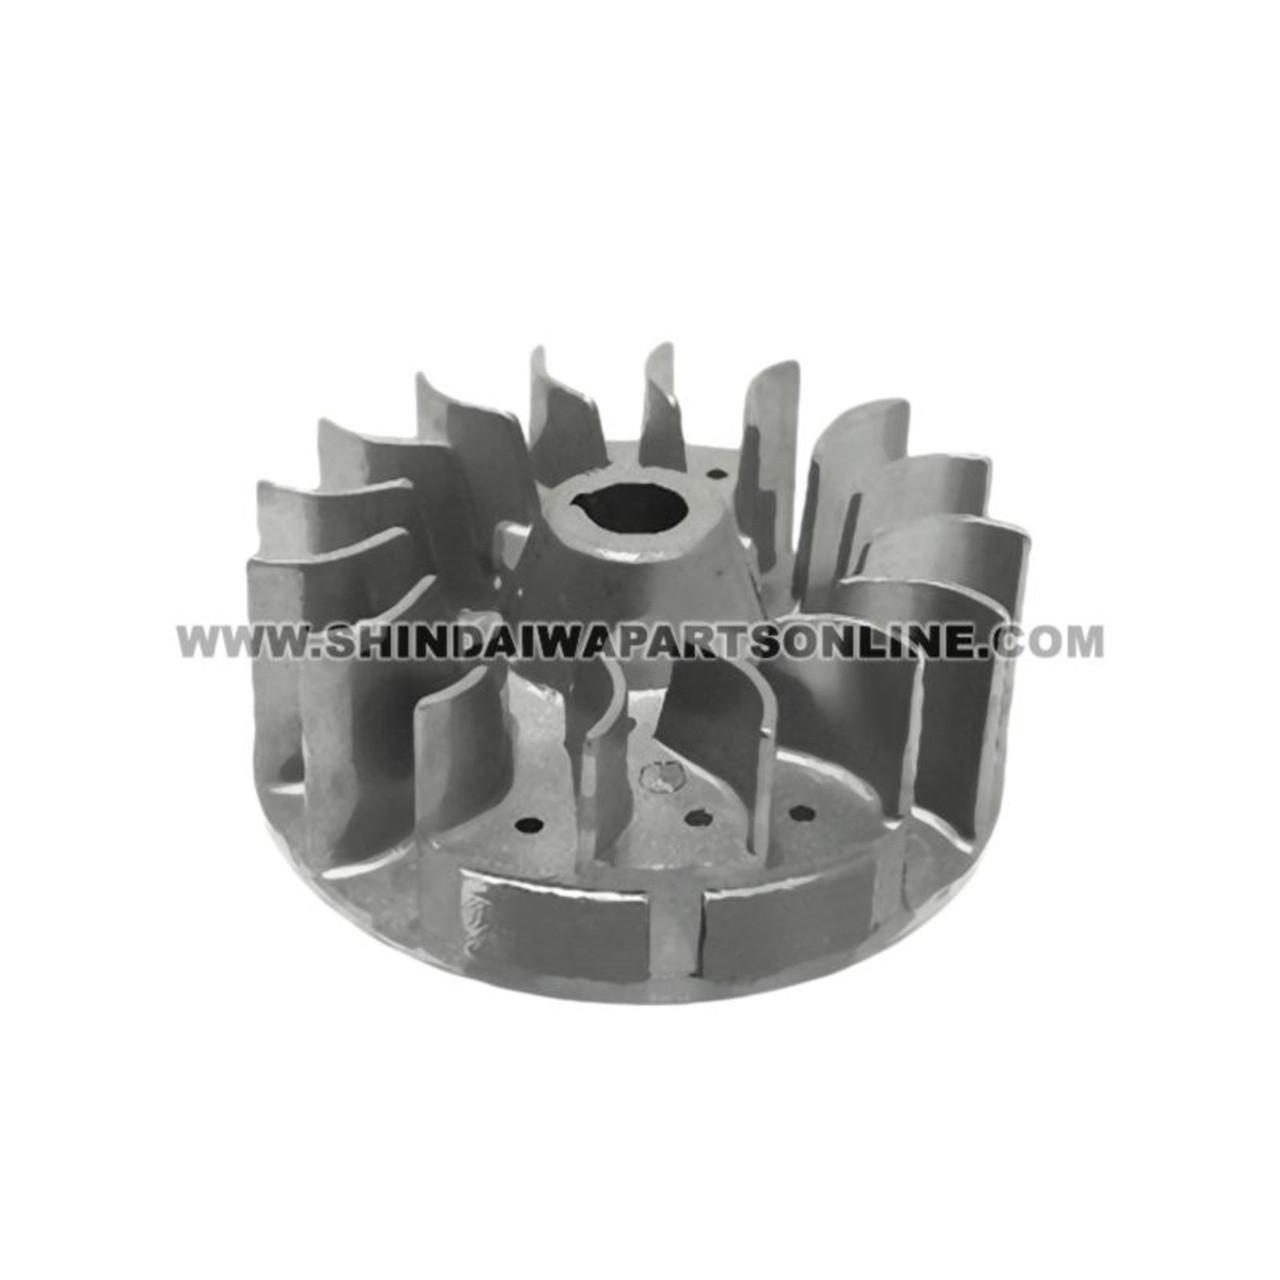 Shindaiwa A409000630 - Flywheel Magnetic